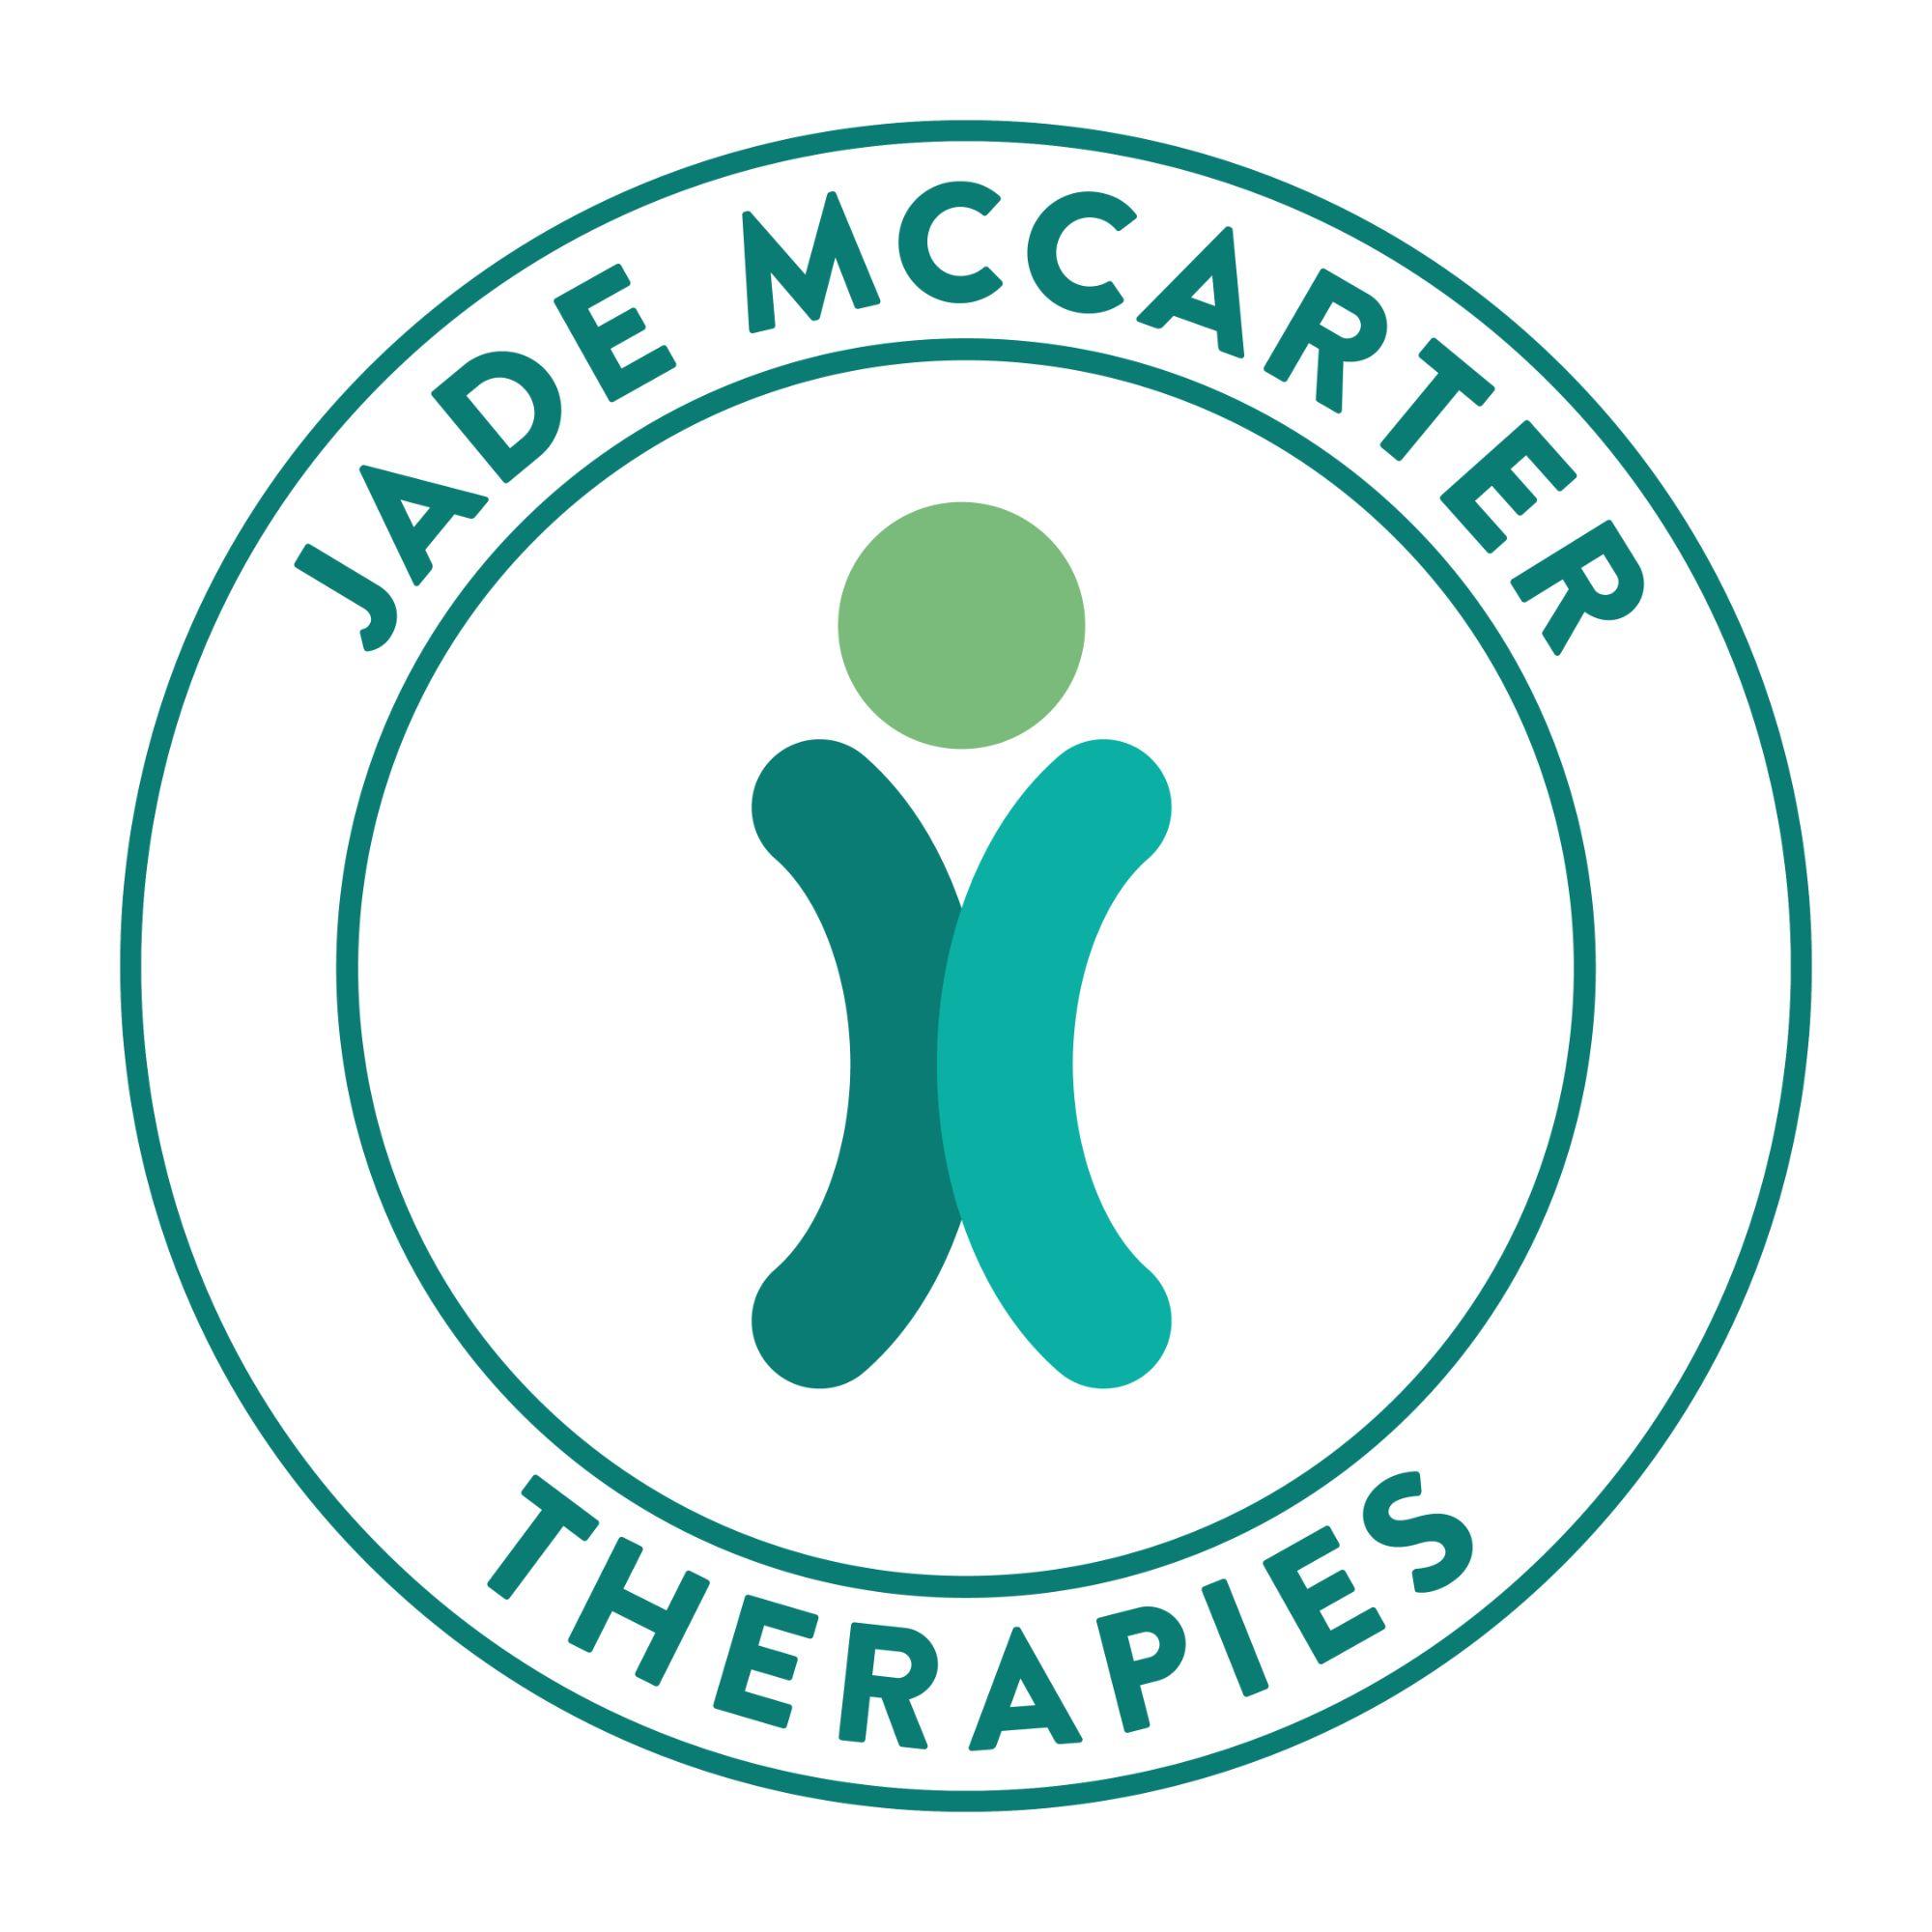 JadeMcTherapies-FullLogo-Light.jpg